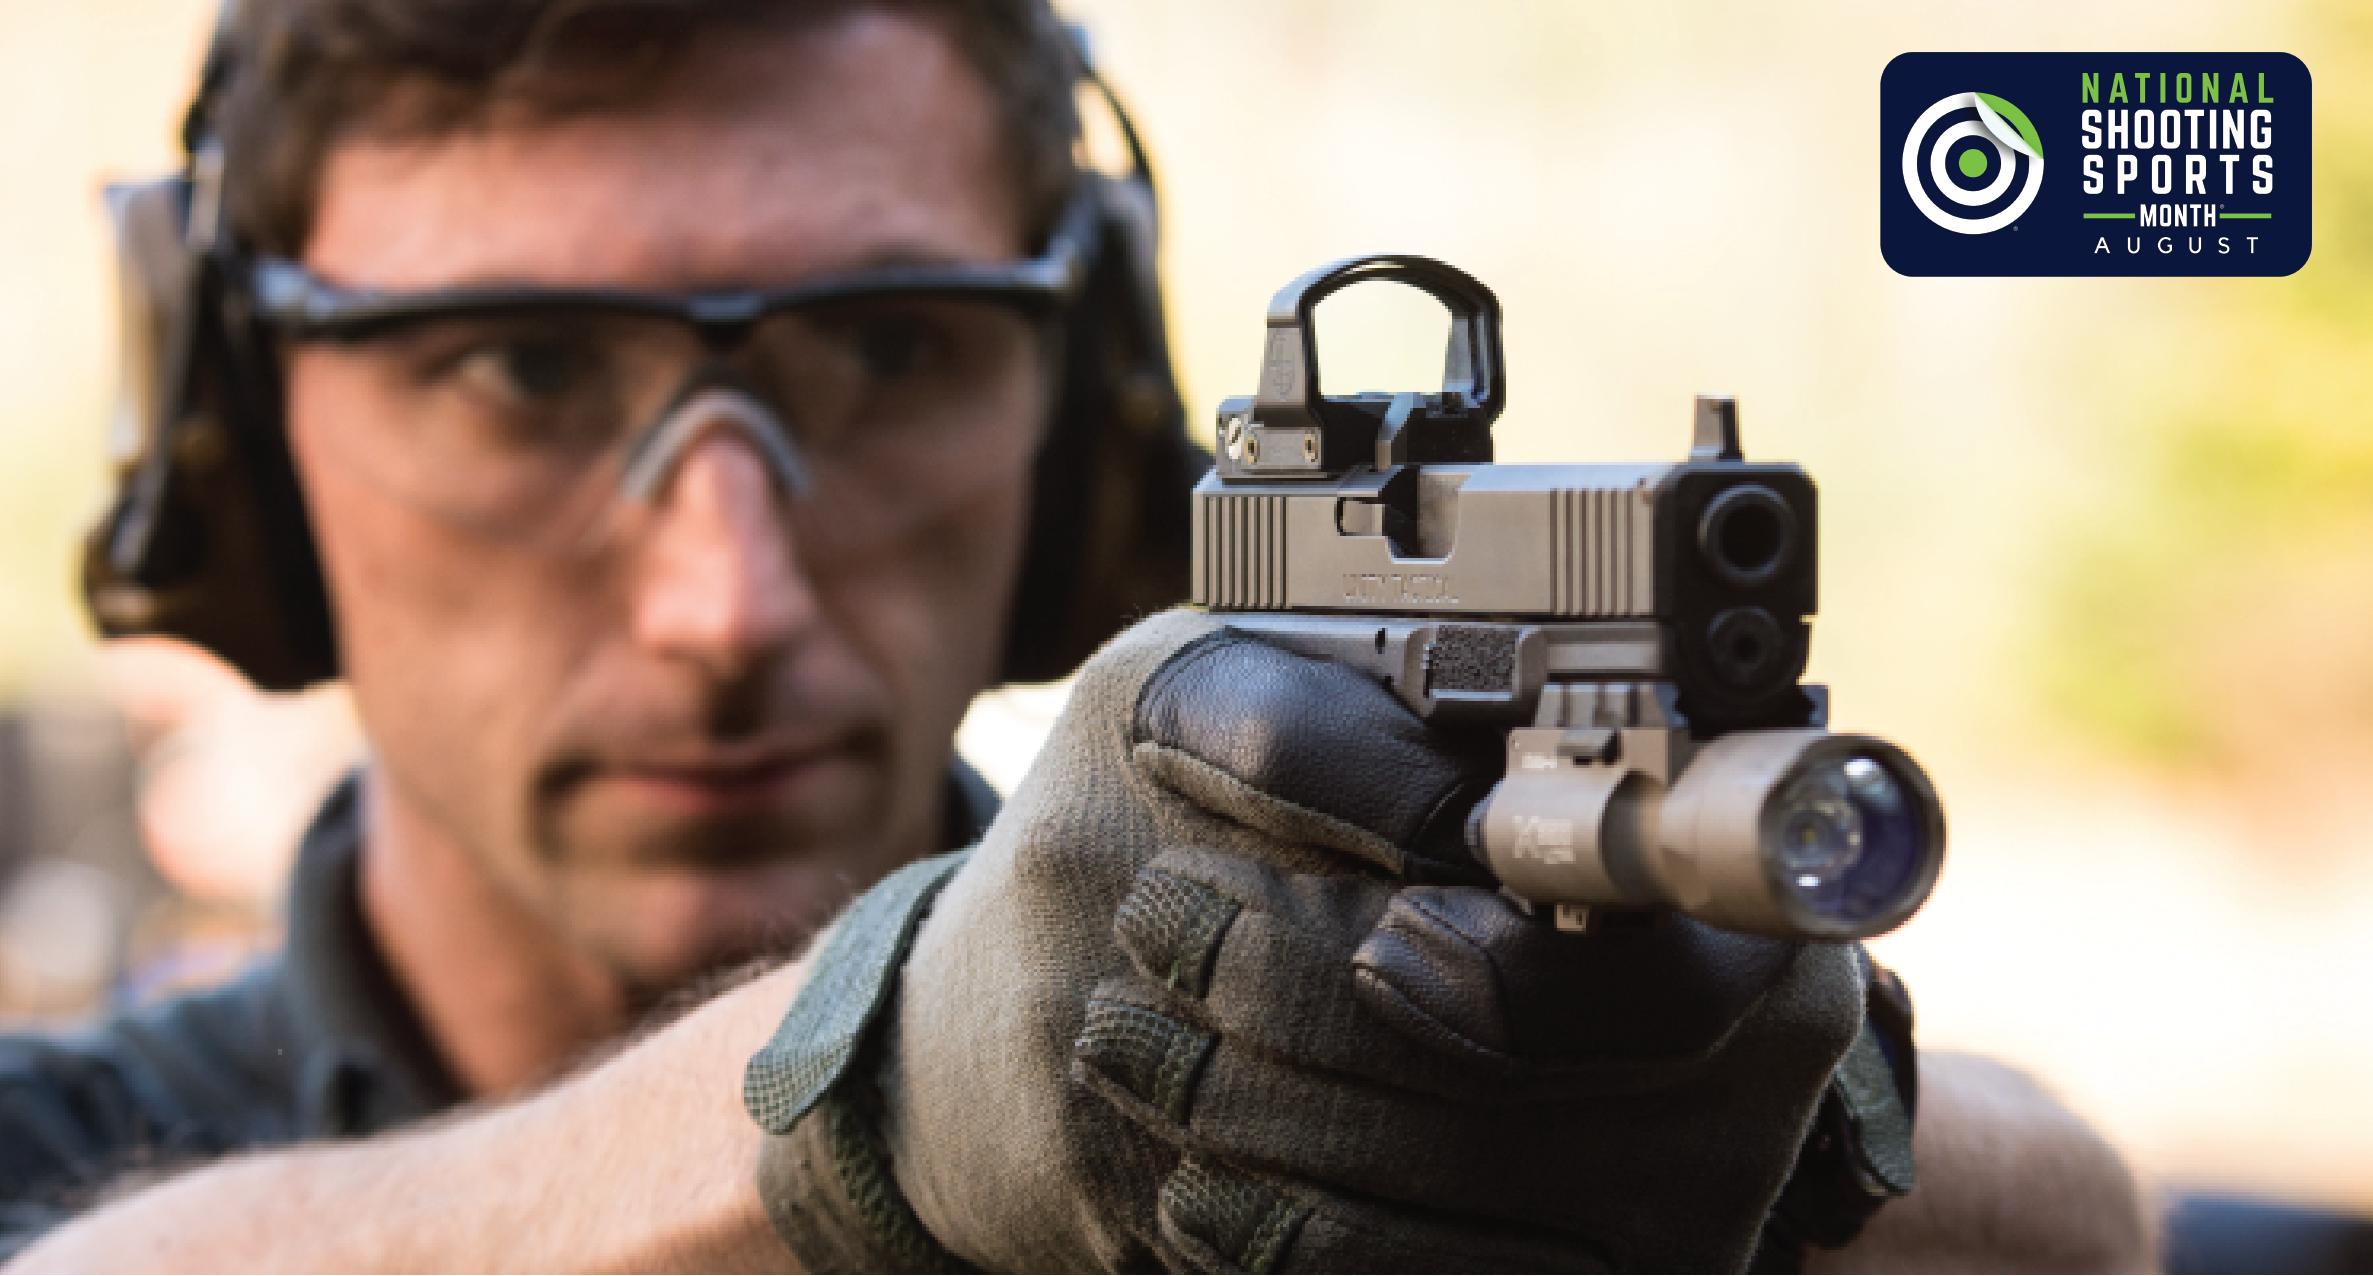 National Shooting Sports Month - Leupold Training Targets